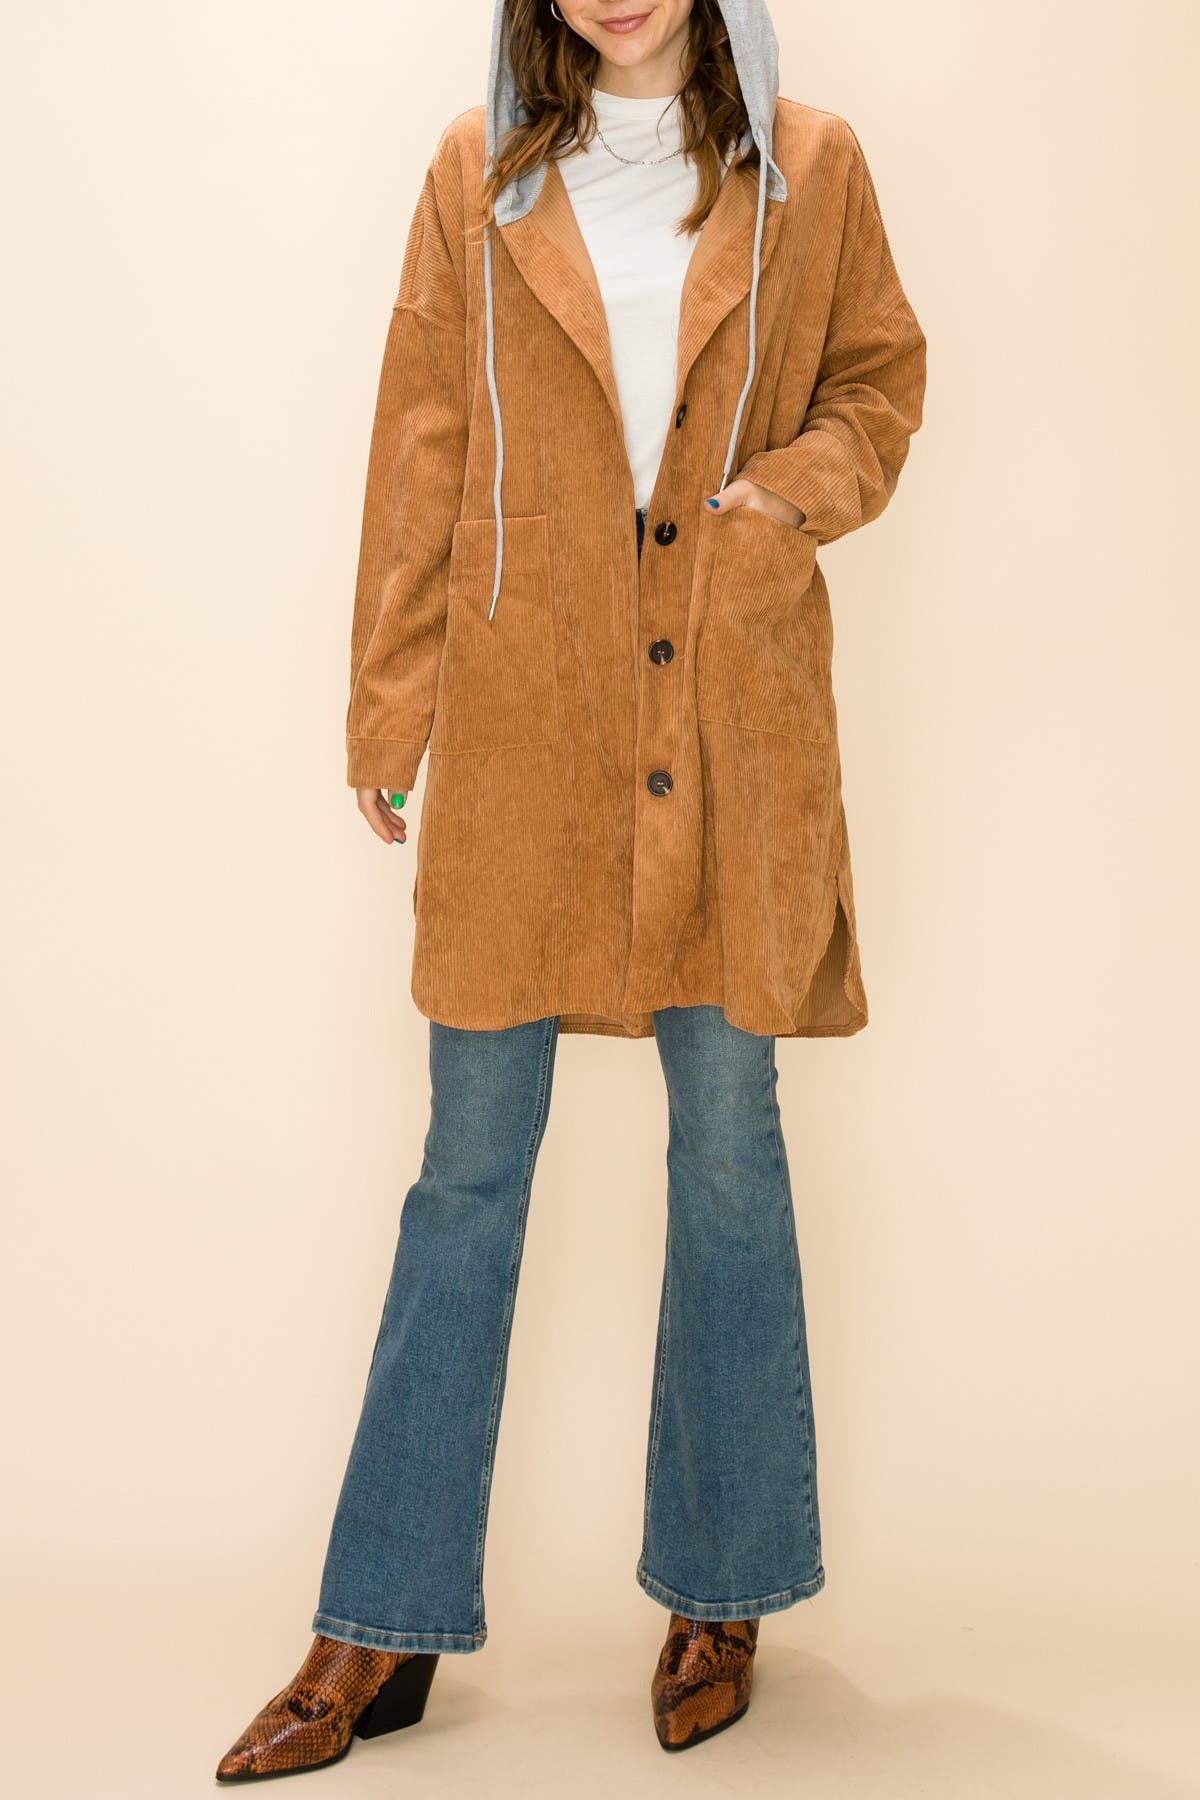 HYFVE Hooded Corduroy Jacket